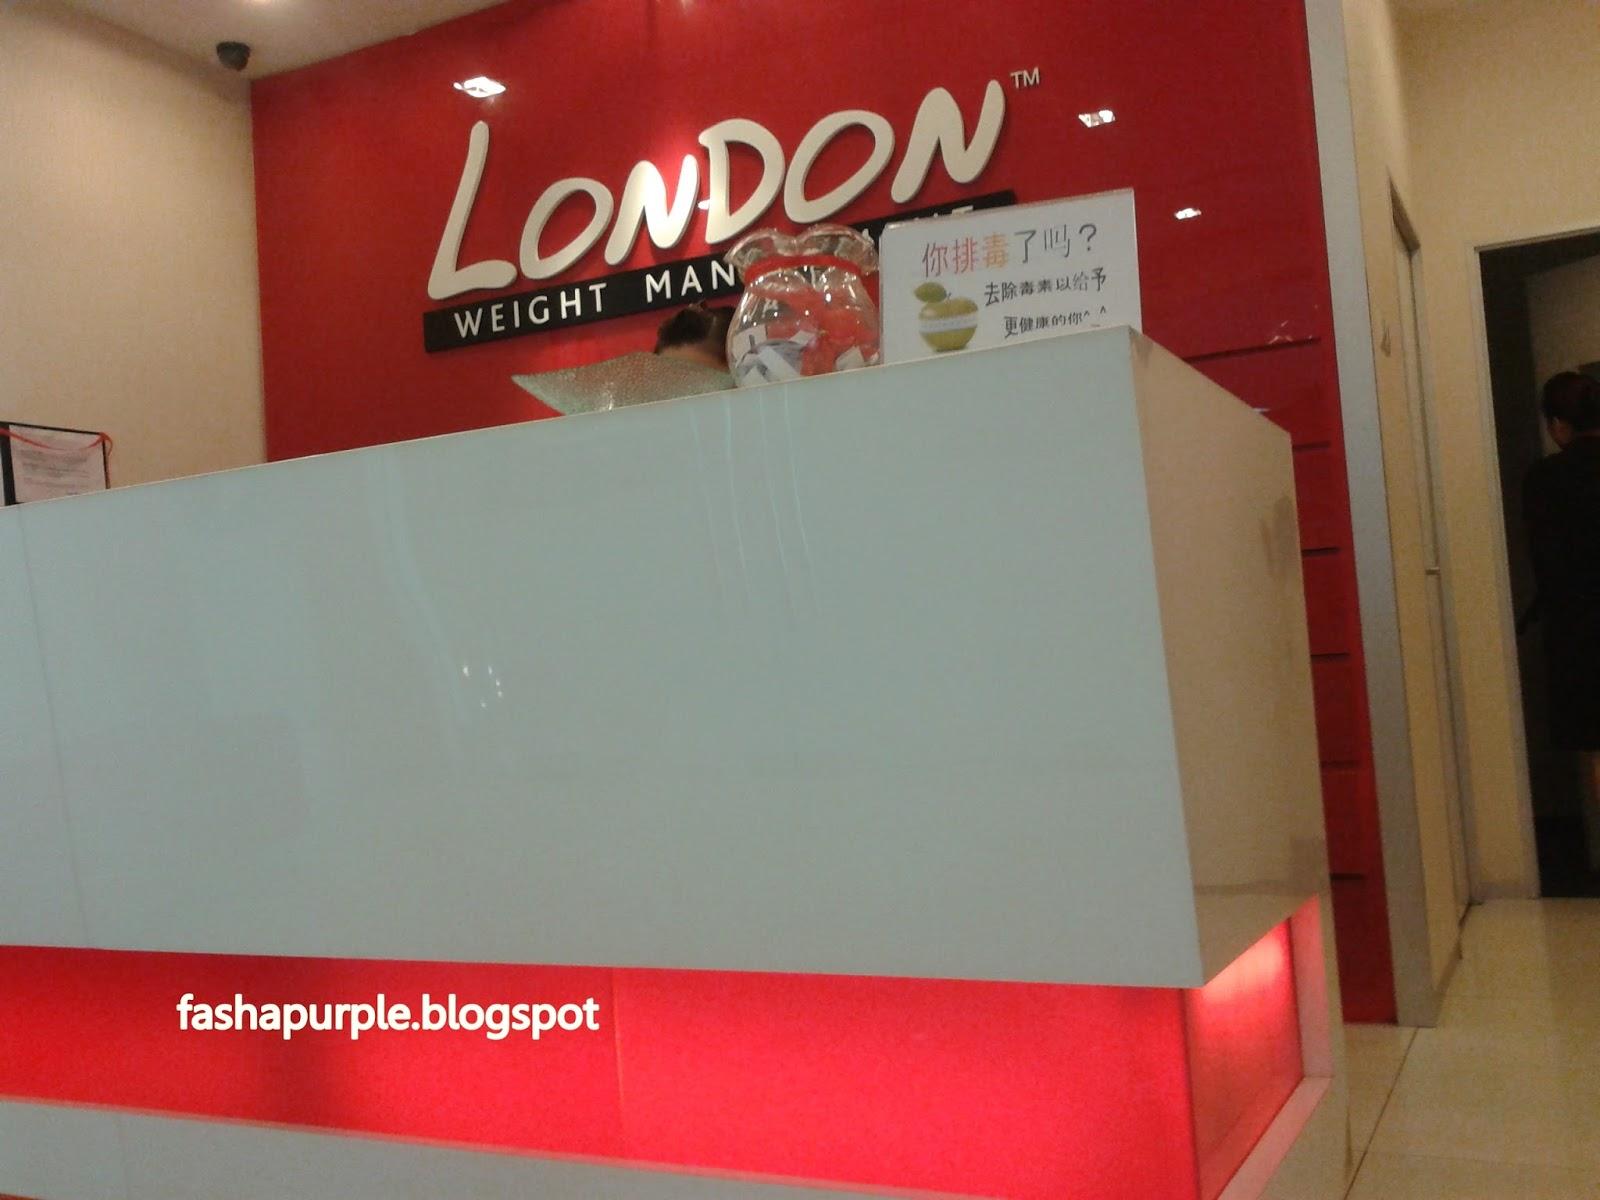 Blog Farah Shahidah A Day With London Weight Management